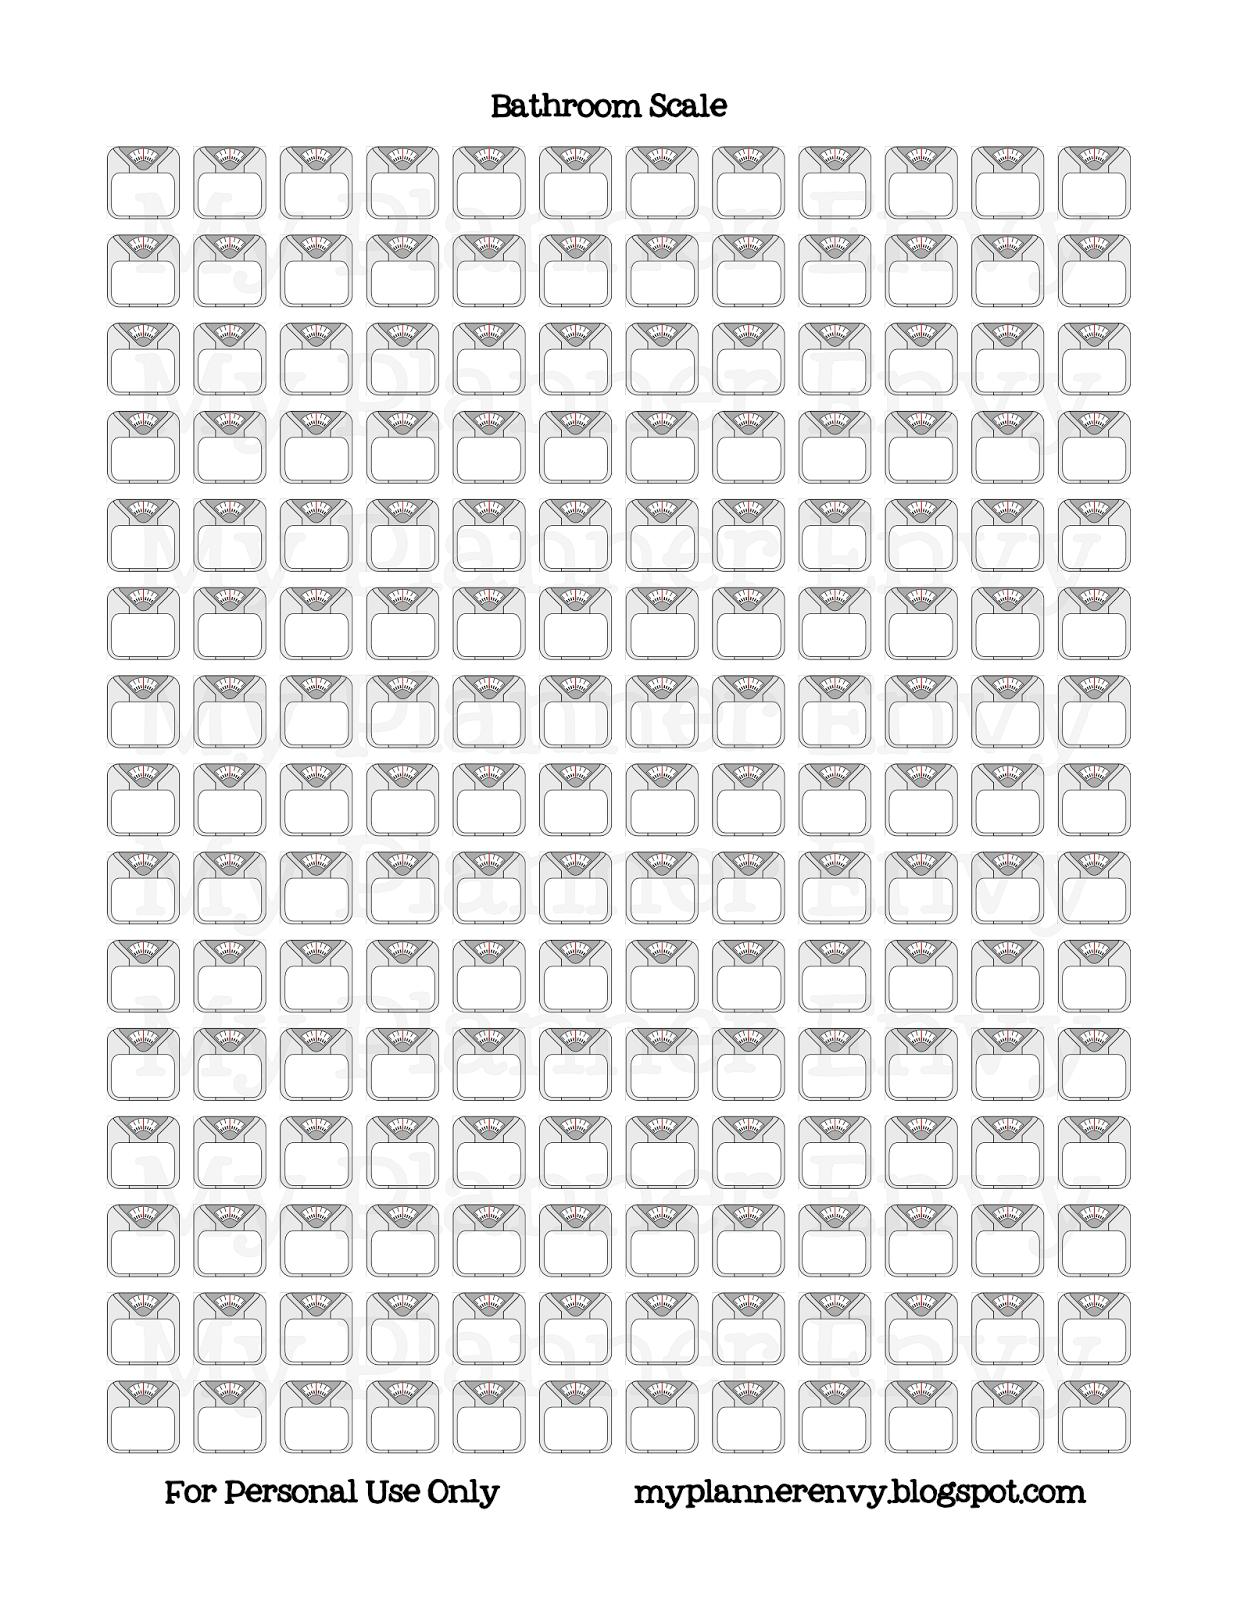 Bathroom Scale Printable - Free Planner Printable Stickers - My ...